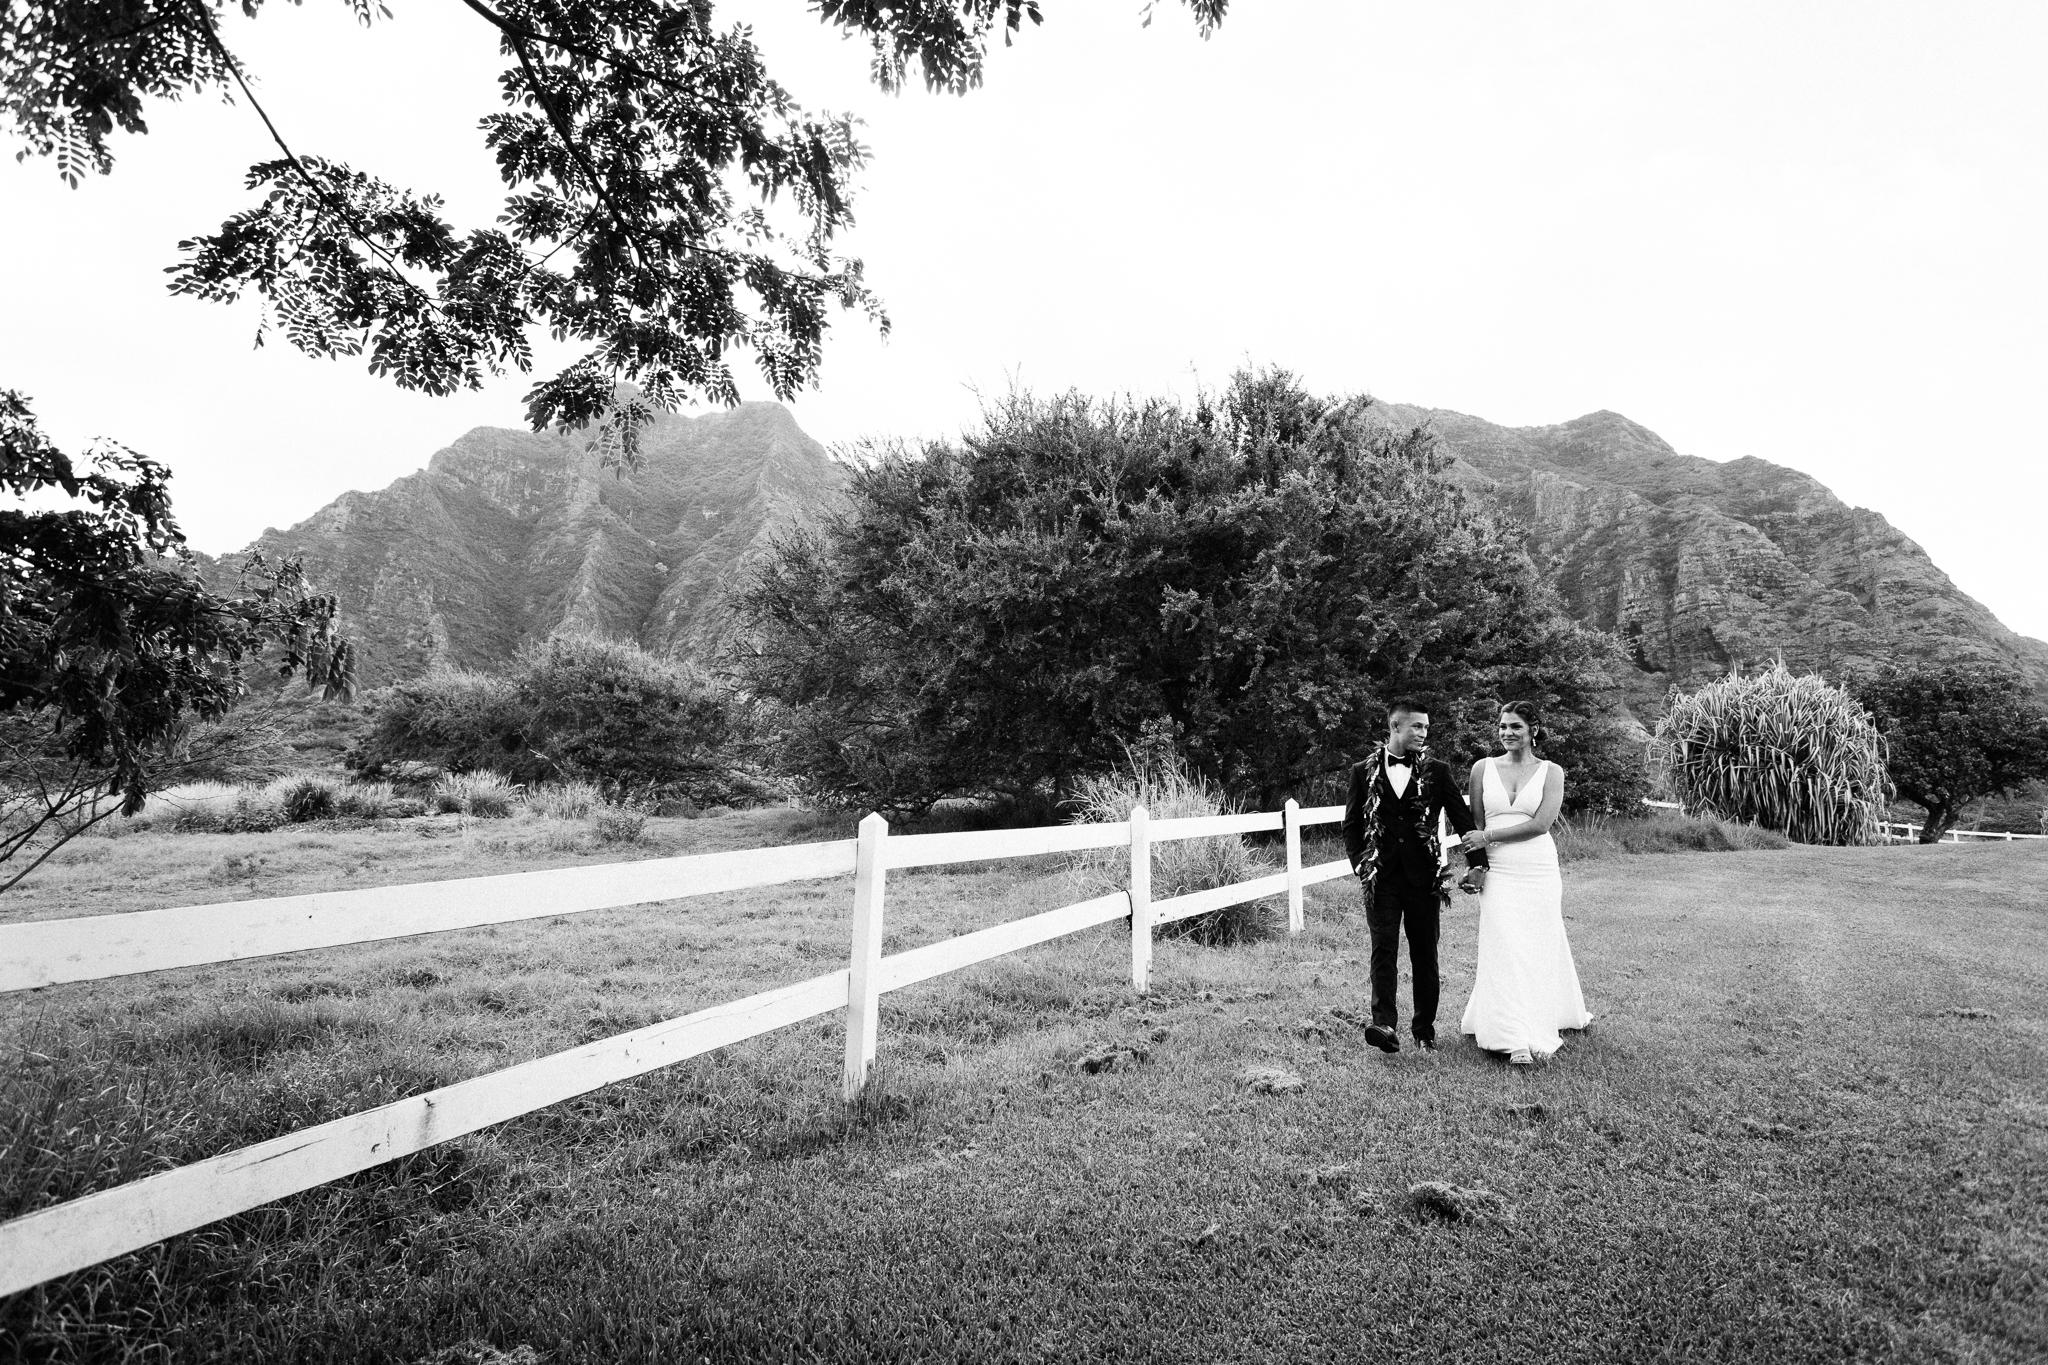 Kualoa_Ranch_Wedding_Photographer_Tone_Hawaii-29.jpg